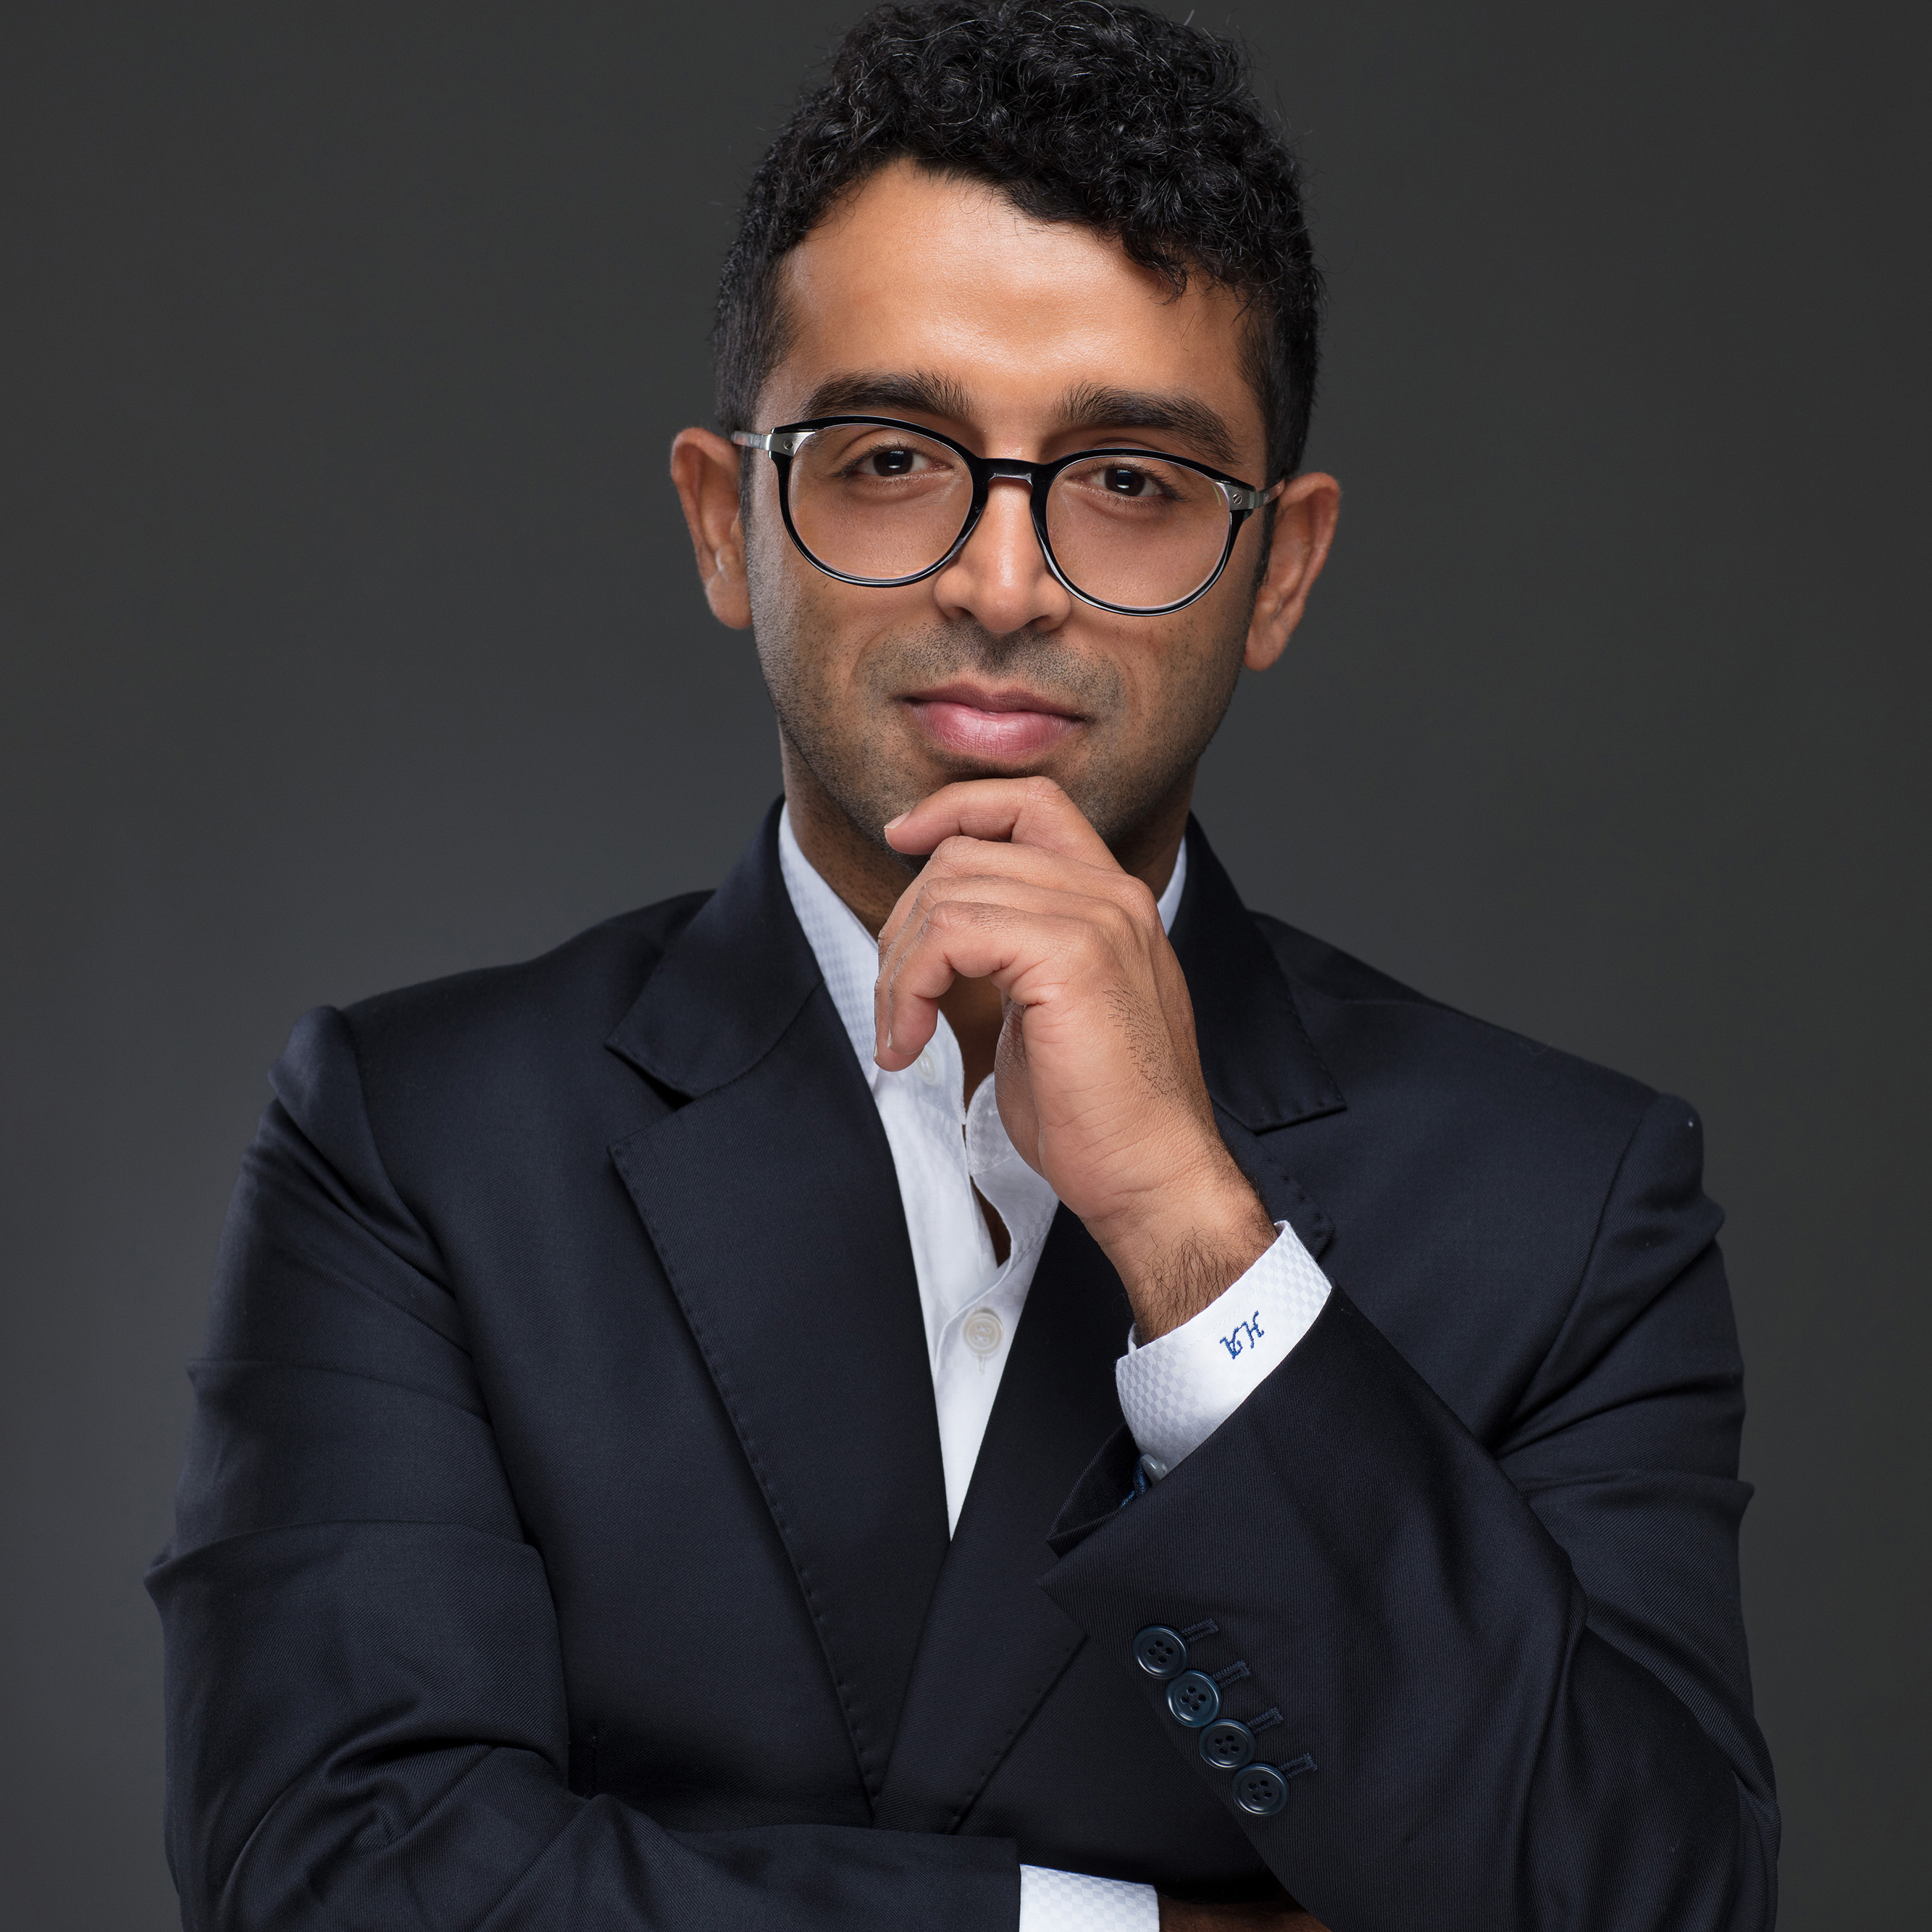 Hassan Alnoon